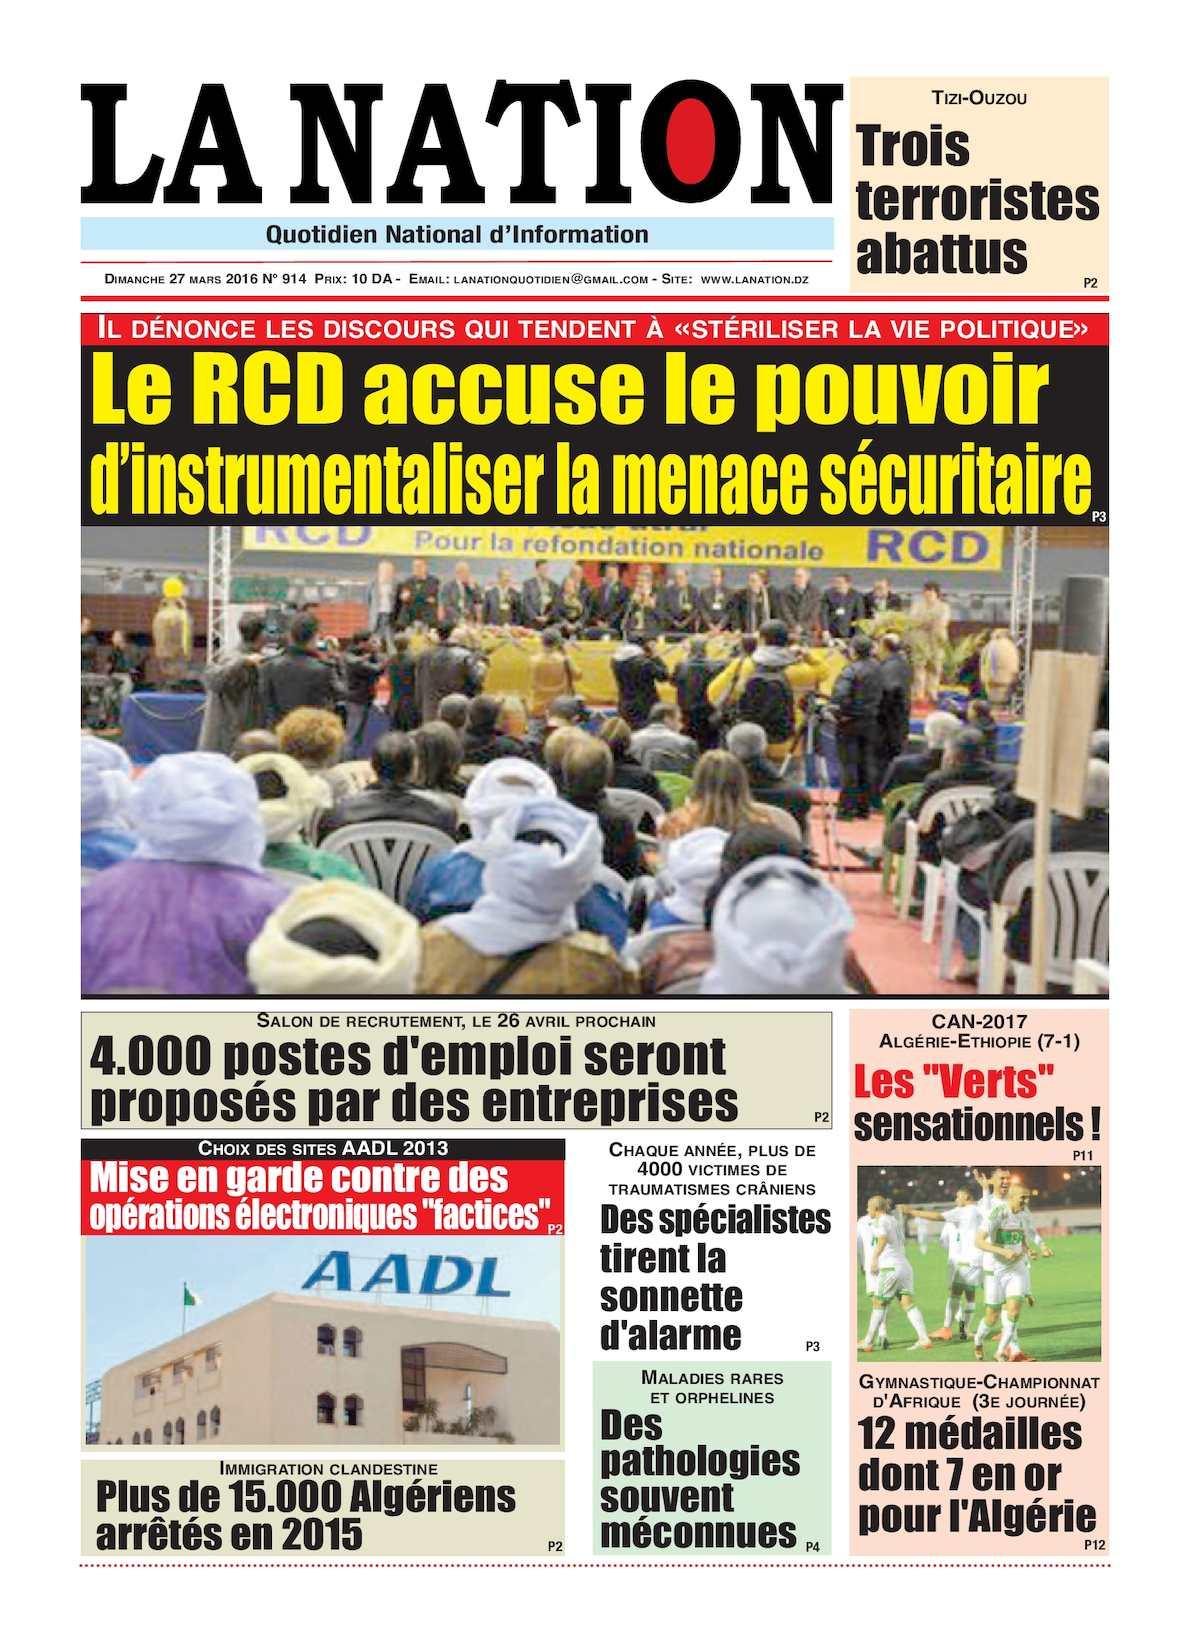 La Nation Edition N 914